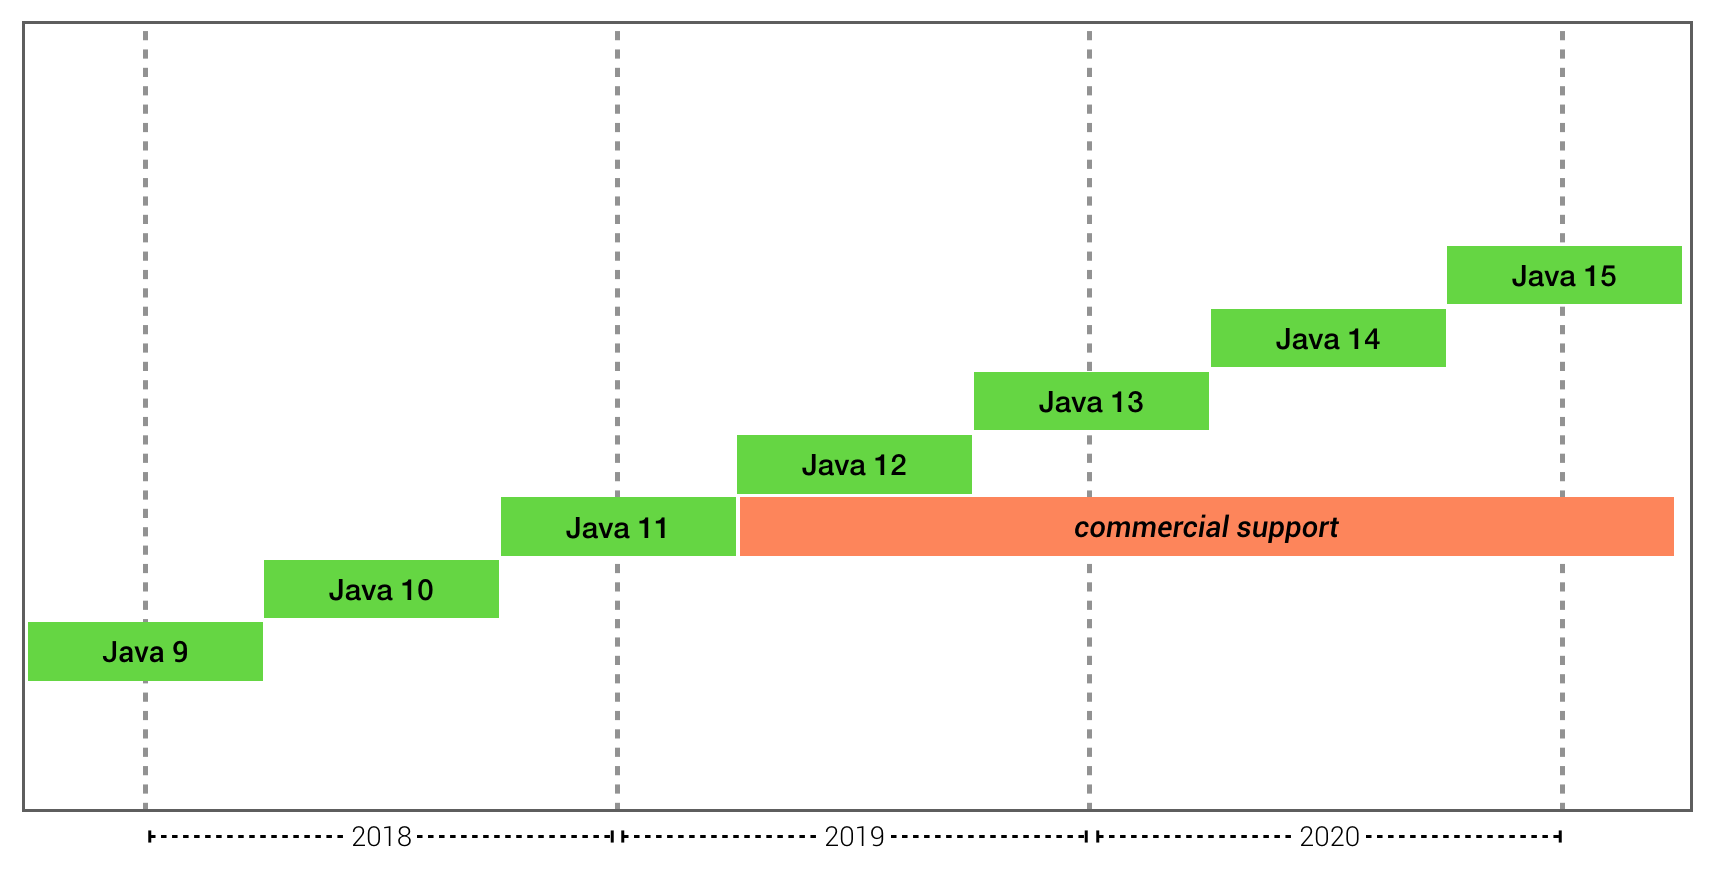 Java release train